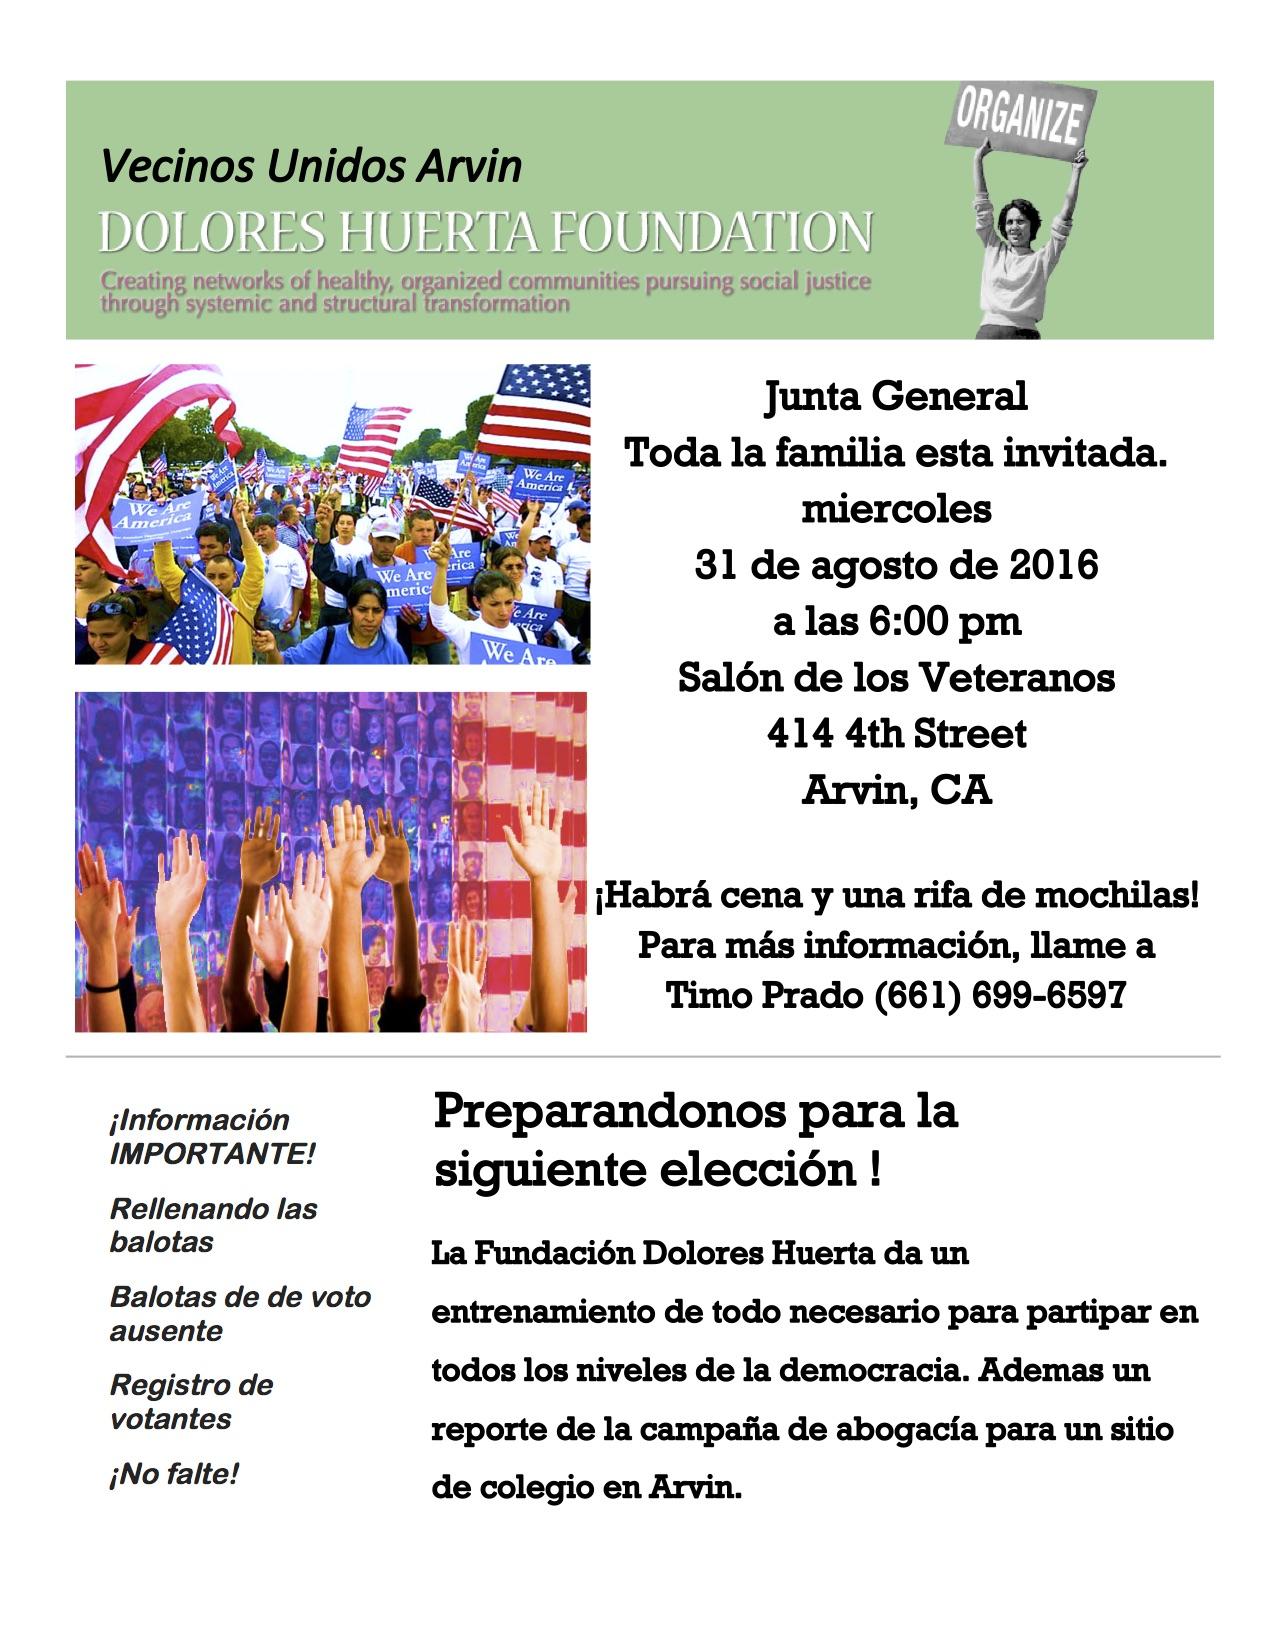 Arvin General Meeting Flyer 8-31-16